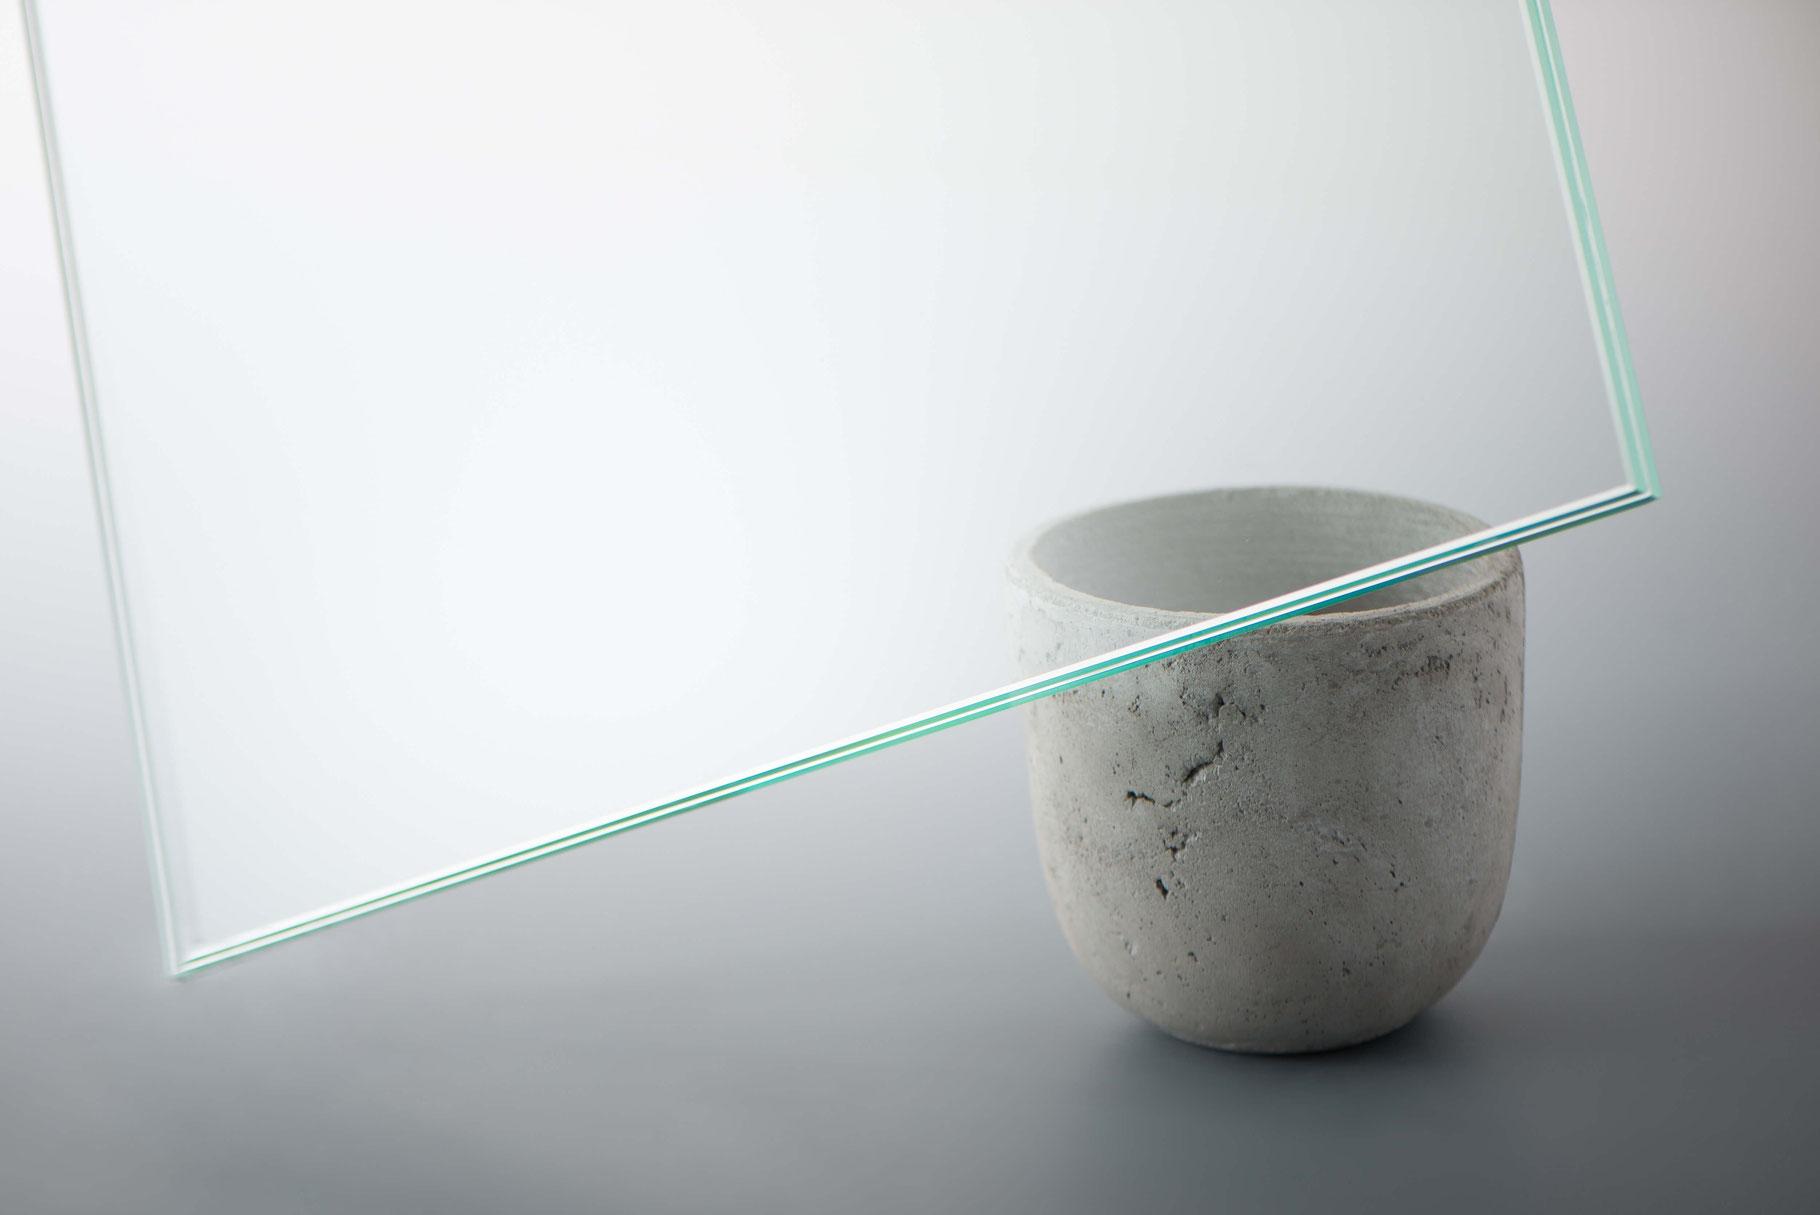 Vsg Glas 10mm ~ Terrassenüberdachung alu mm sicherheitsglas vsg glas klar m